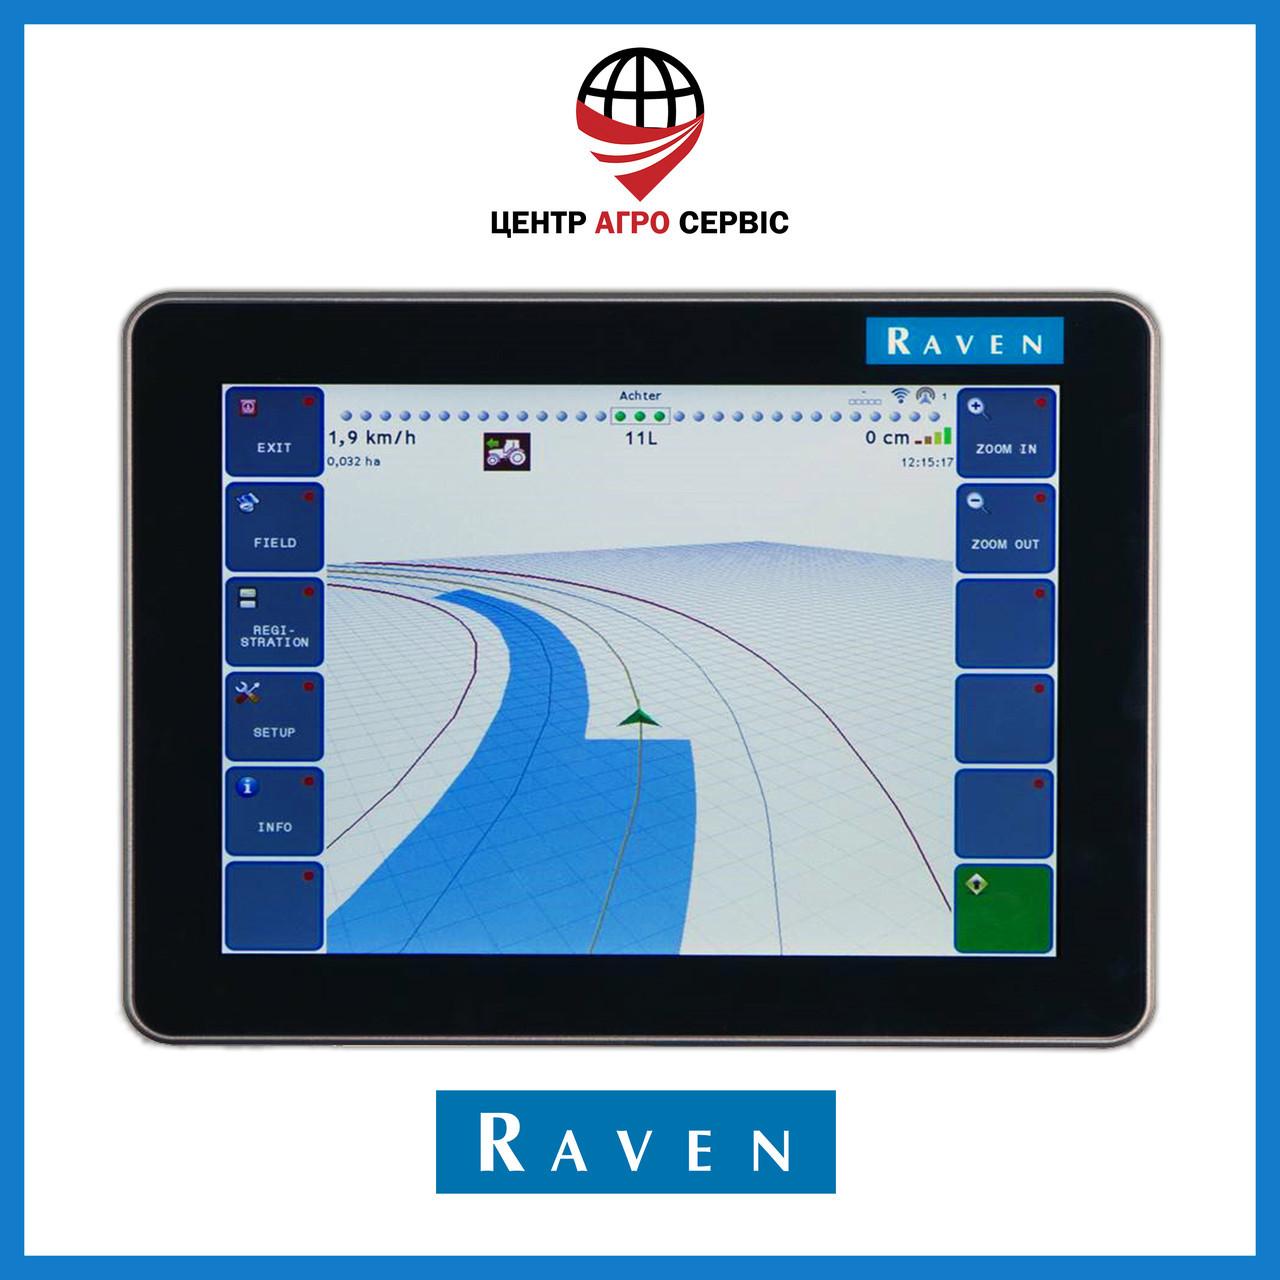 Gps навигатор для трактора (навигатор для поля, сельхоз навигатор)  Равен вайпер 4